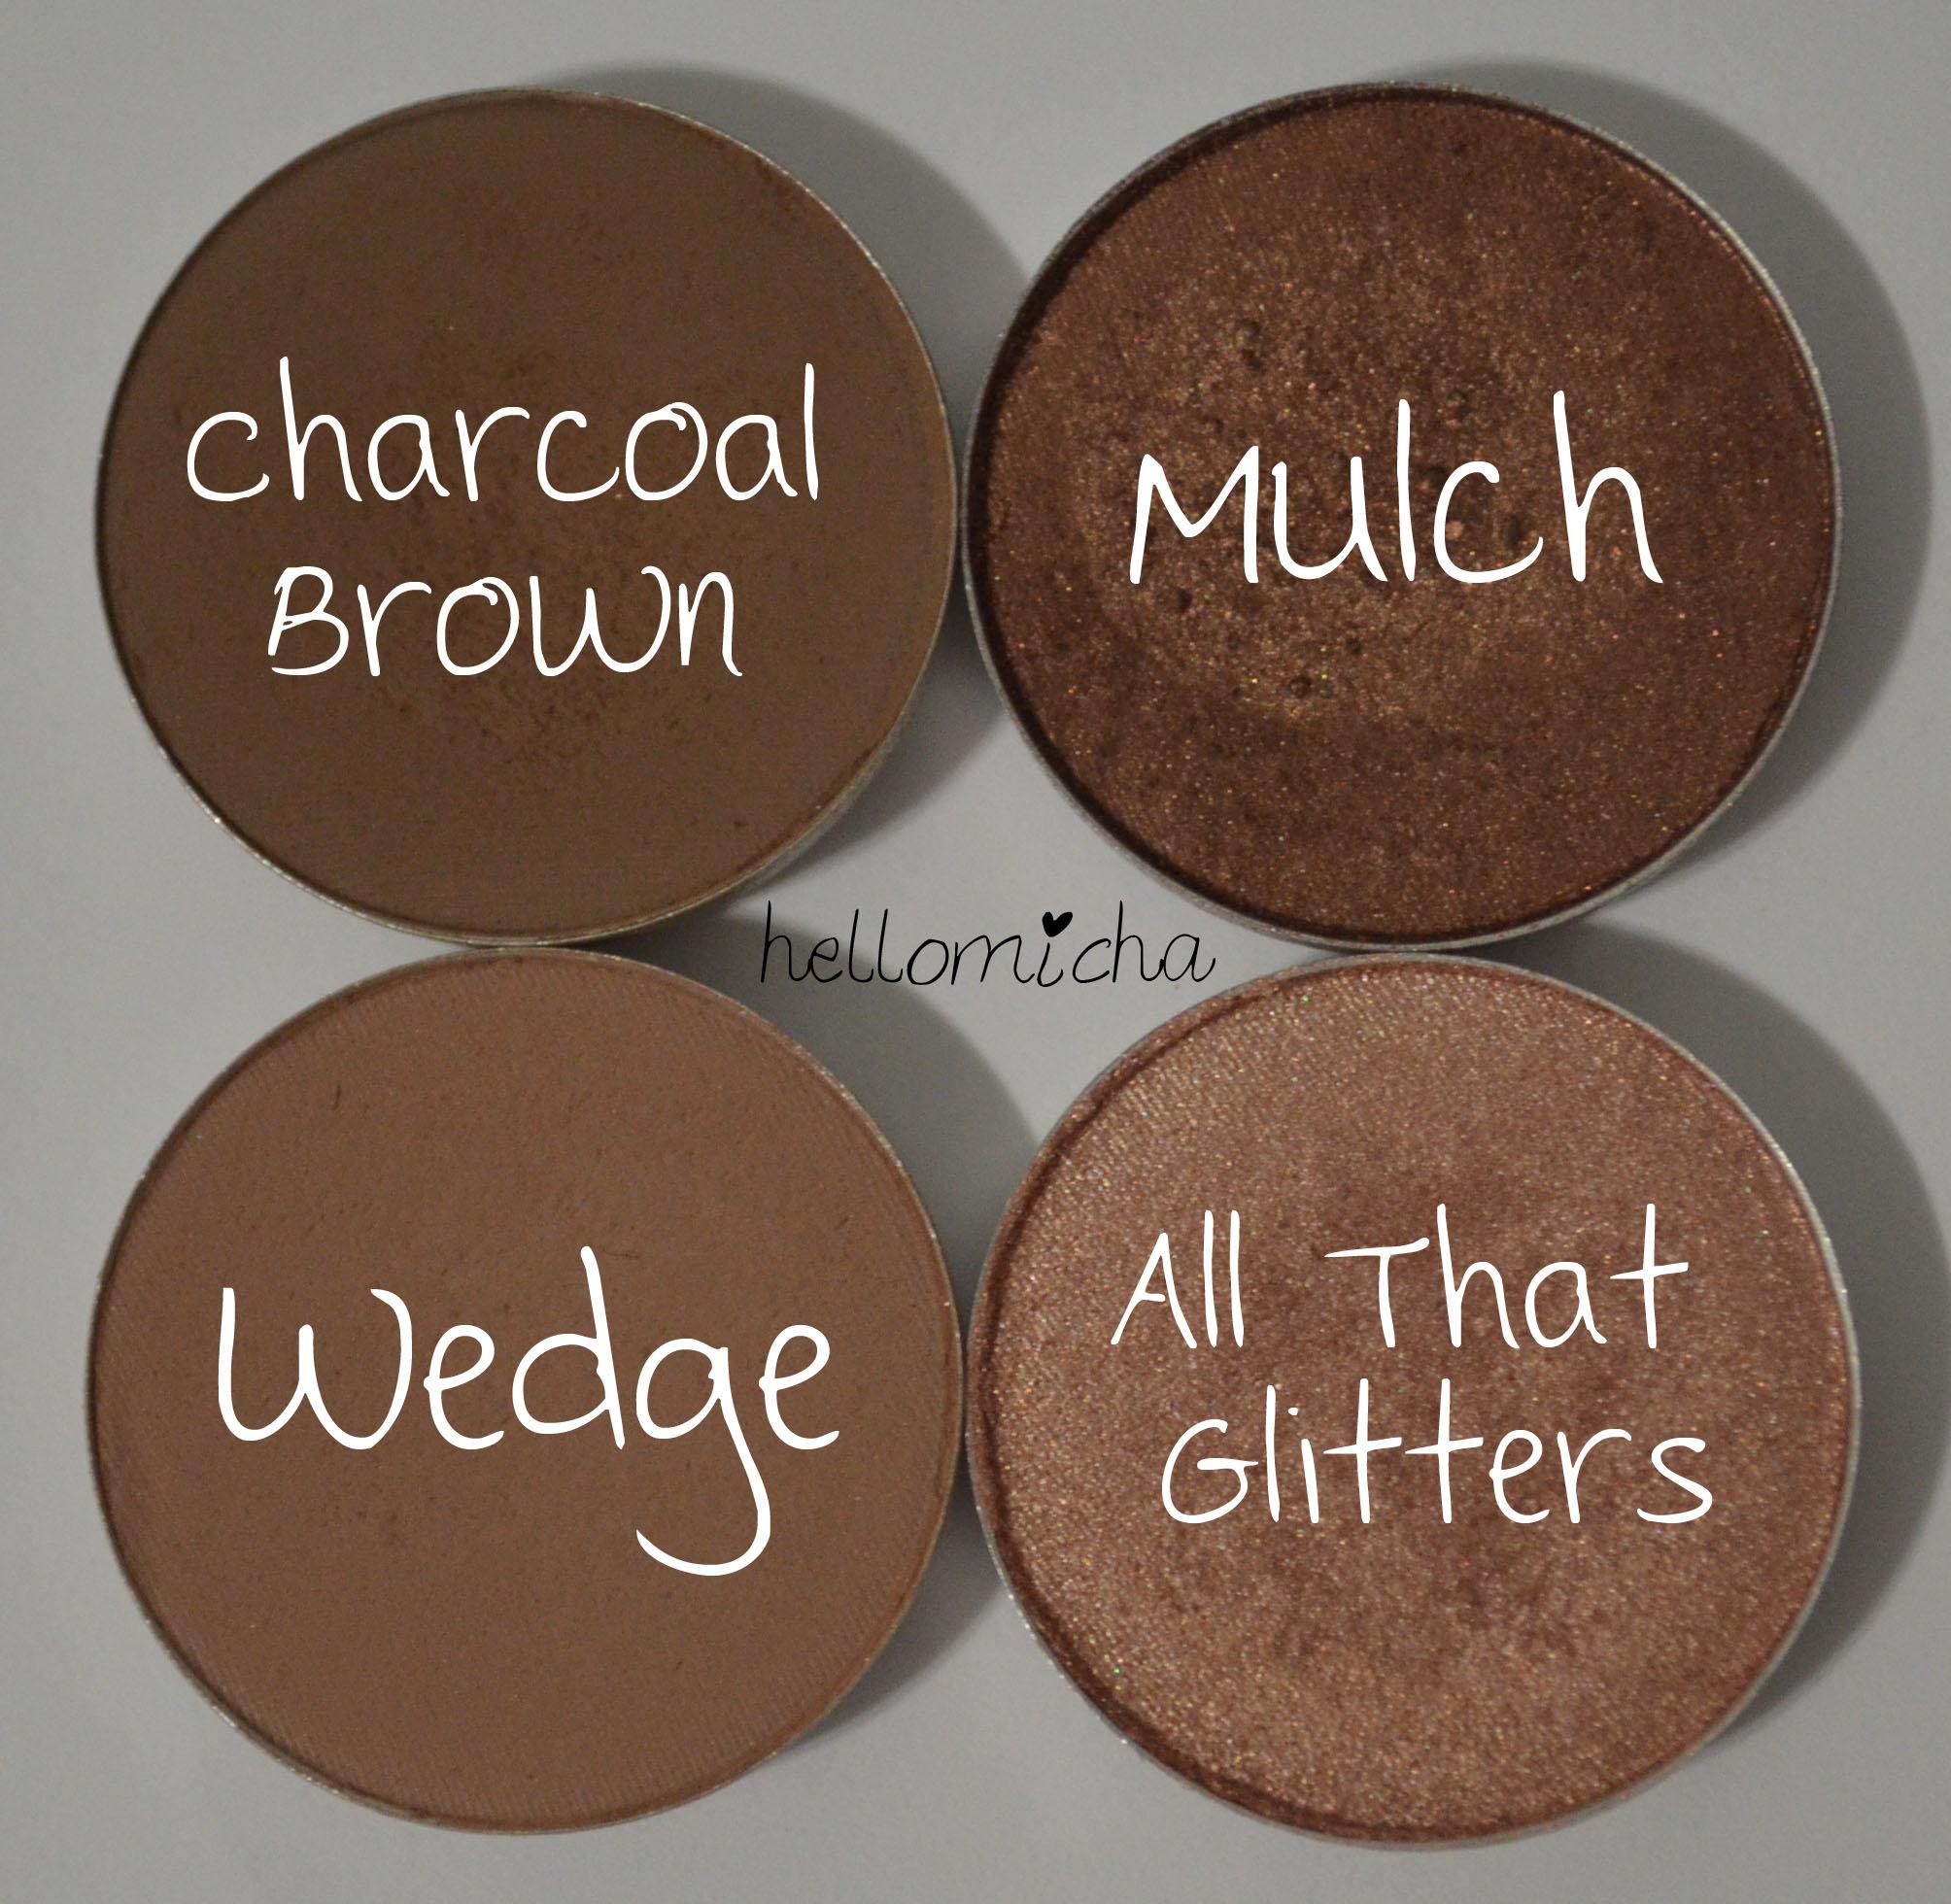 mac charcoal brown - photo #4